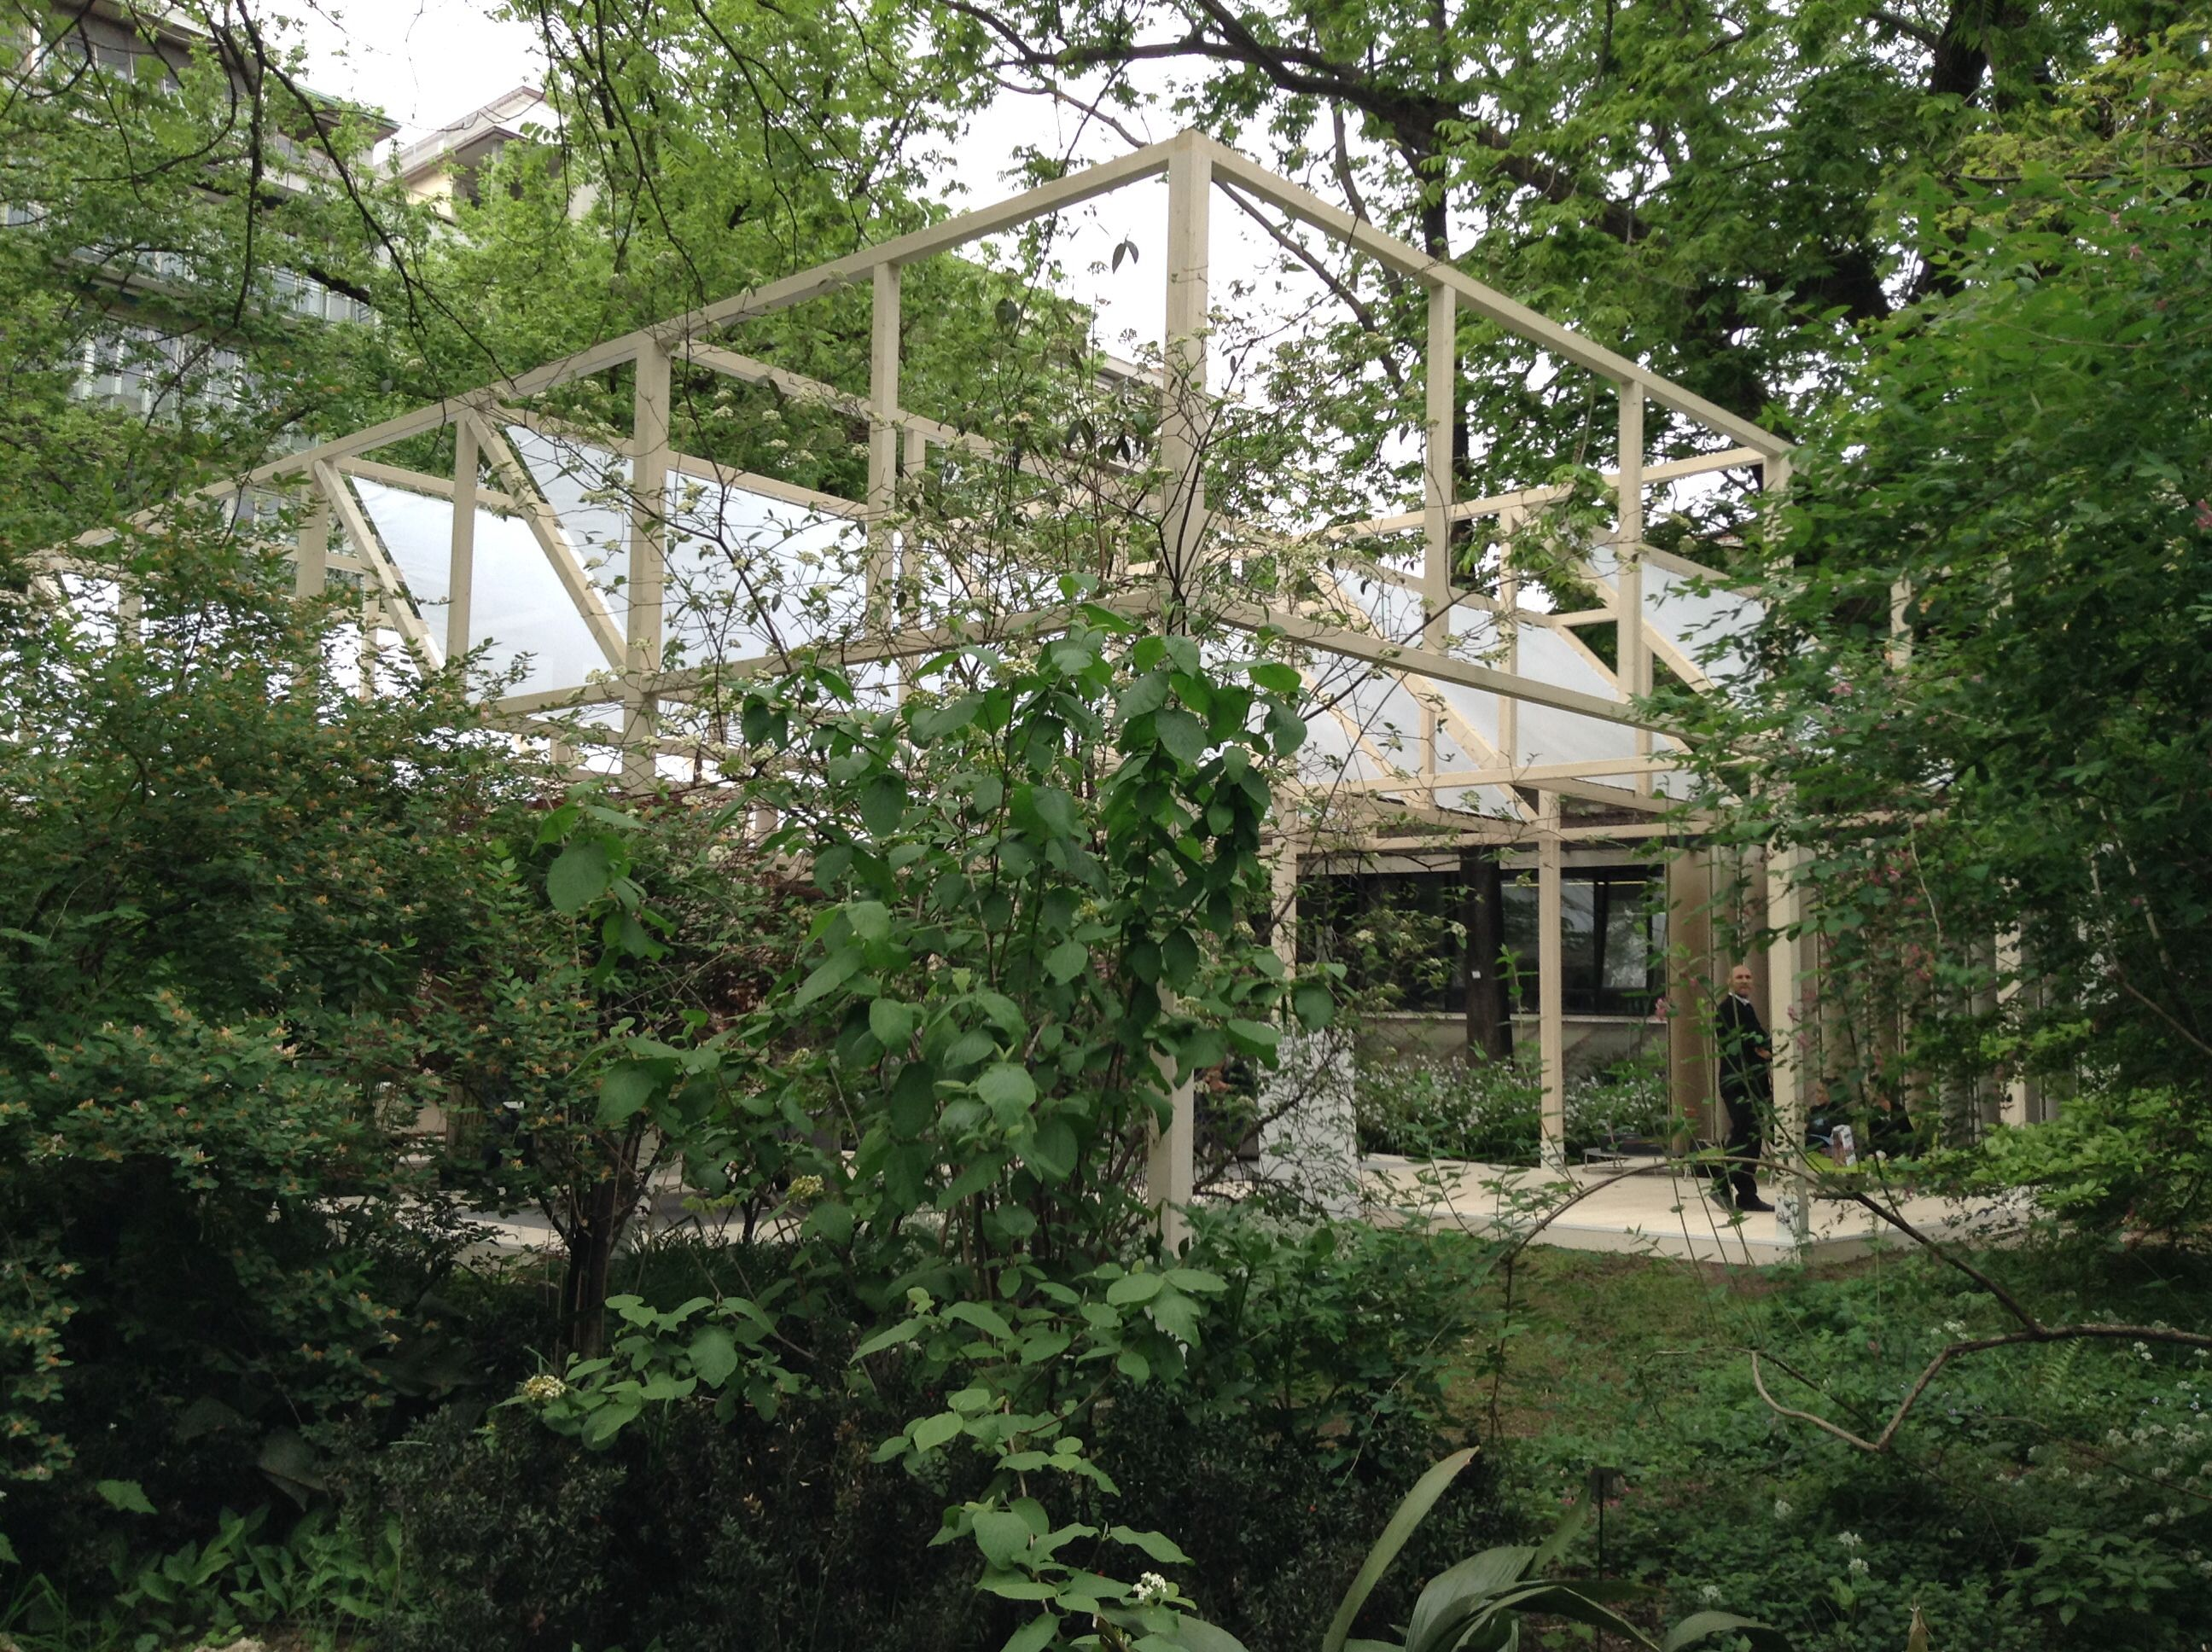 Orto botanico|Brera Milano|GaiaFappani